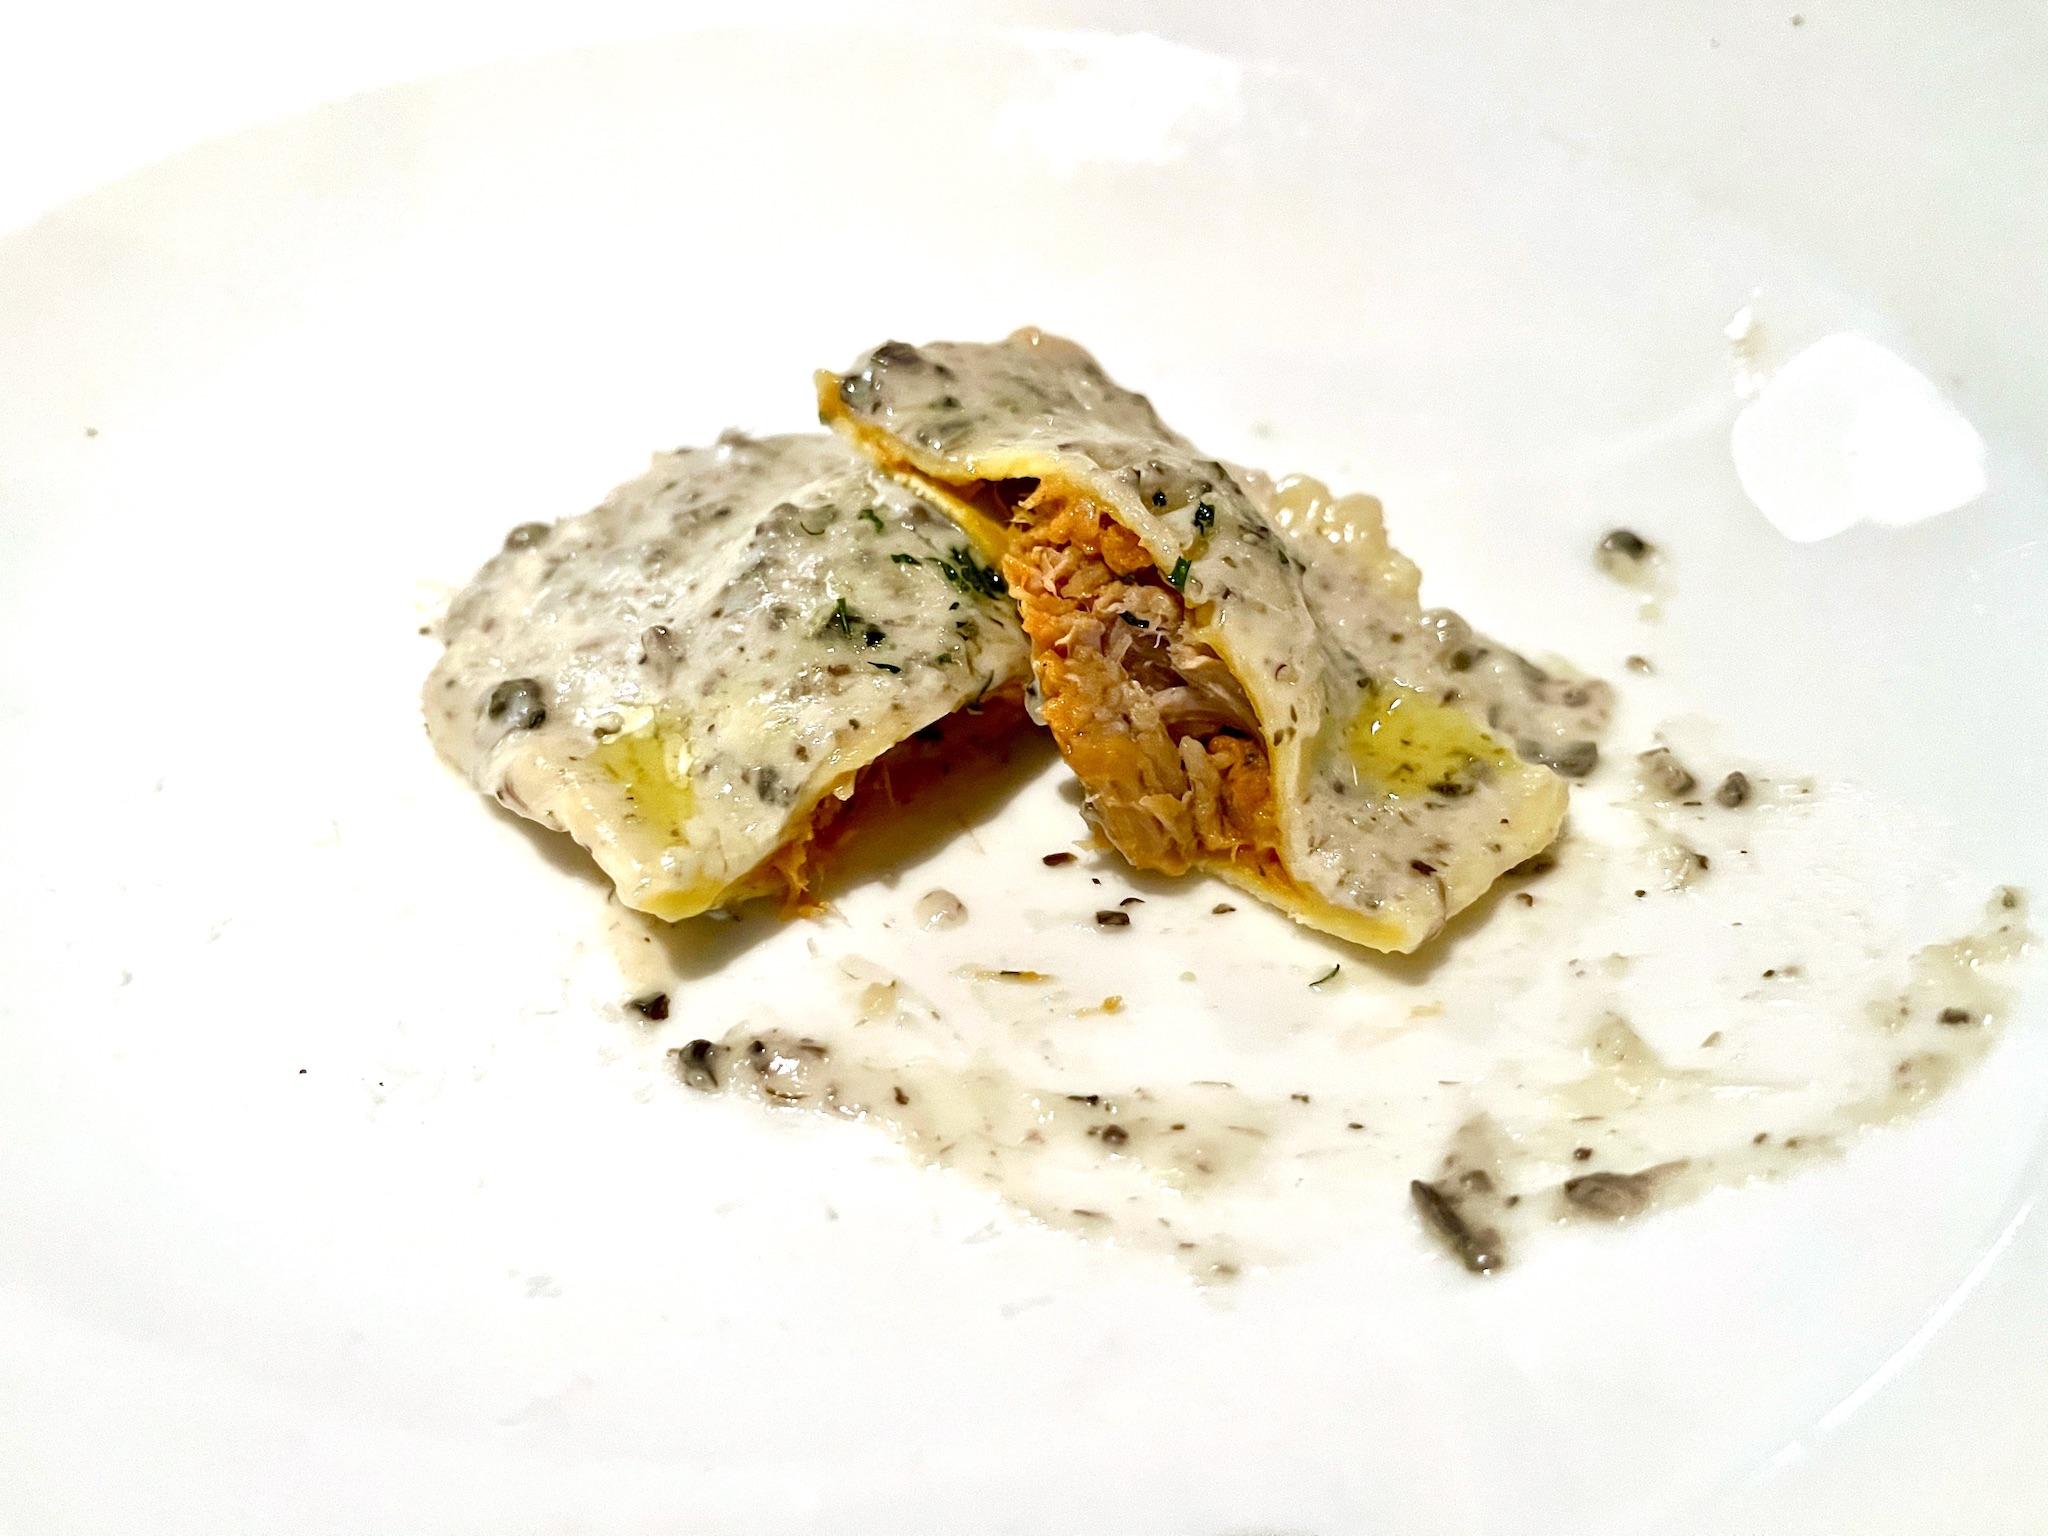 Sea Salt Veal Ravioli with a Truffle Cream Sauce